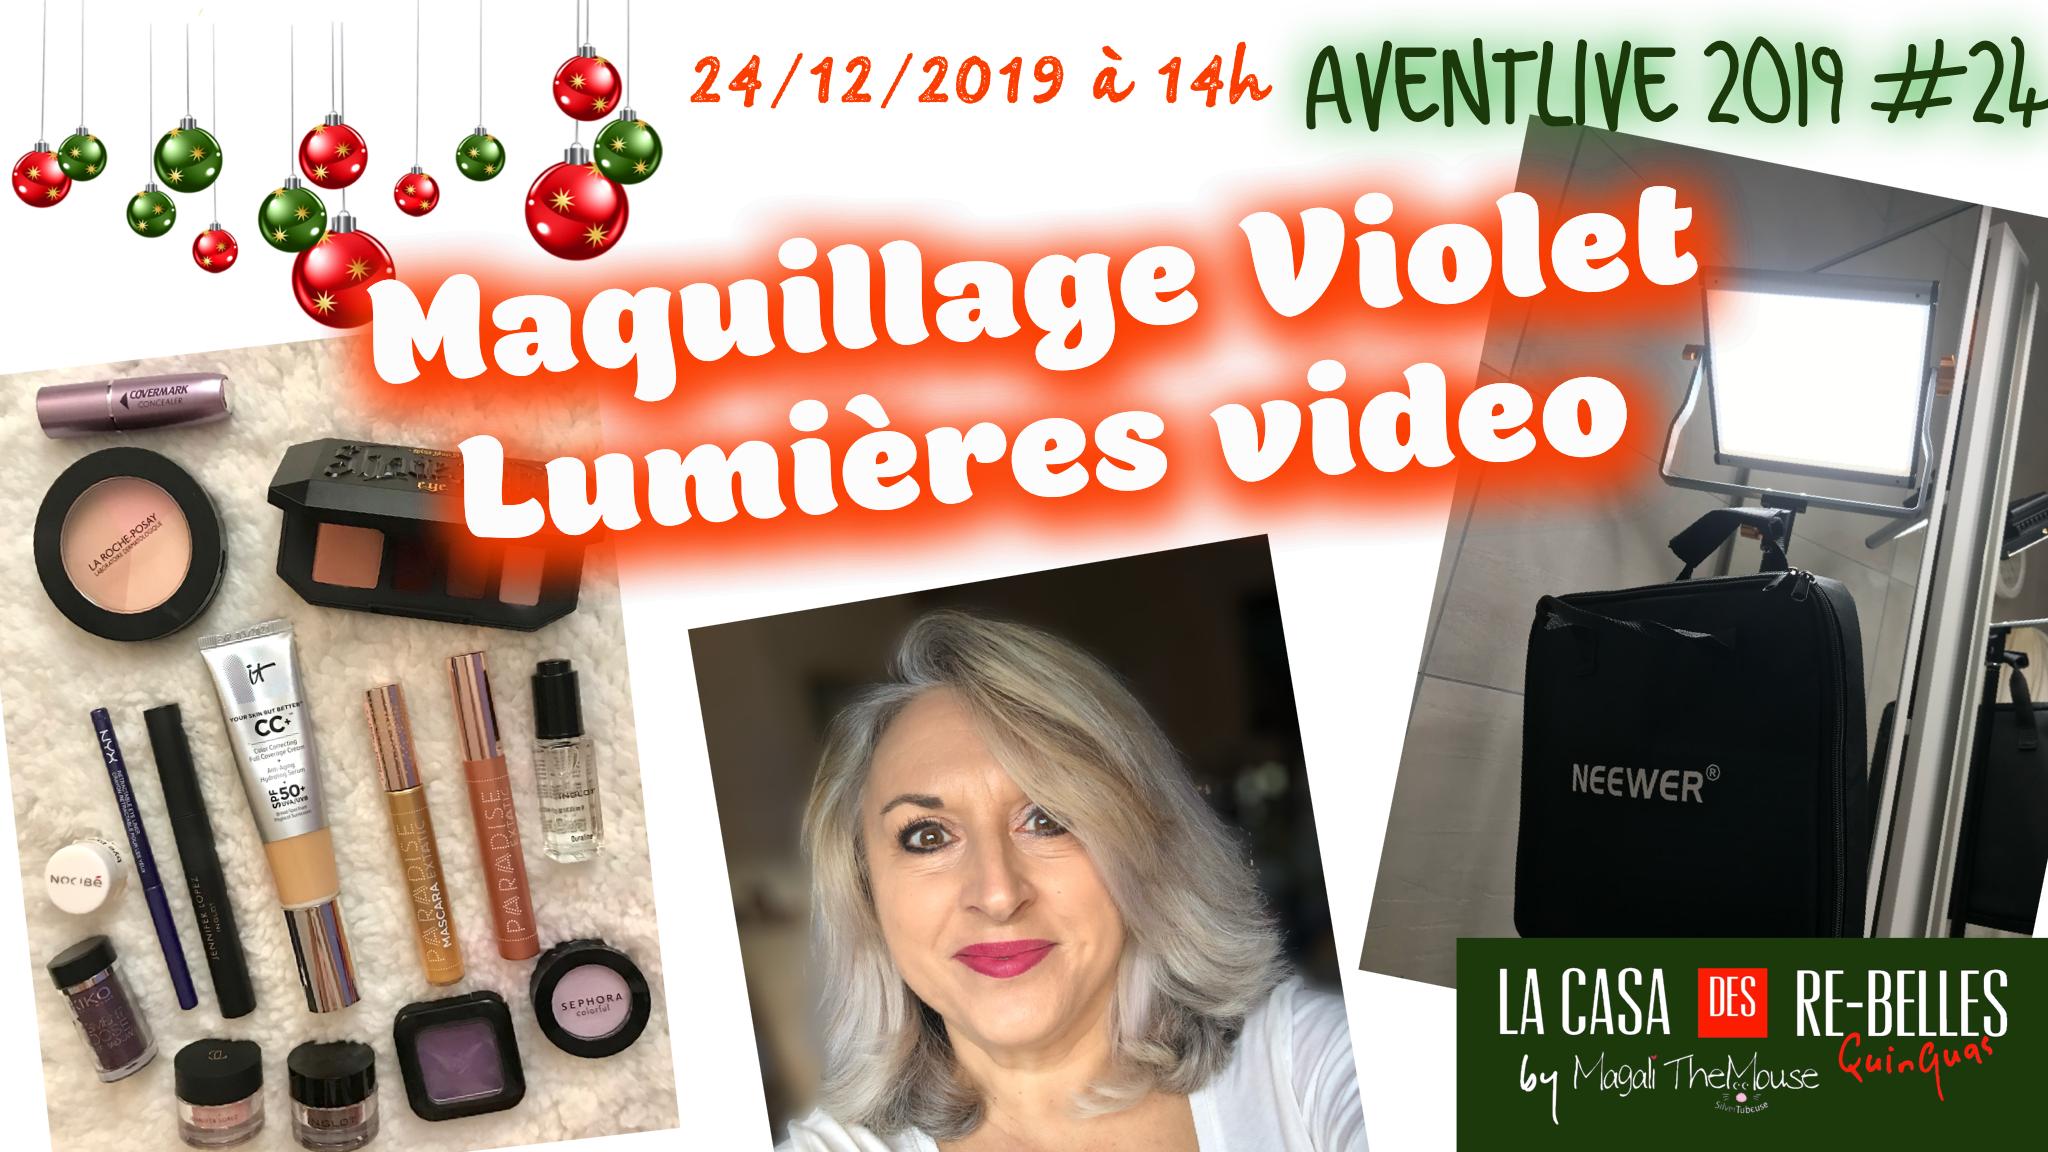 Maquillage violet… lumières video… bilan 2019